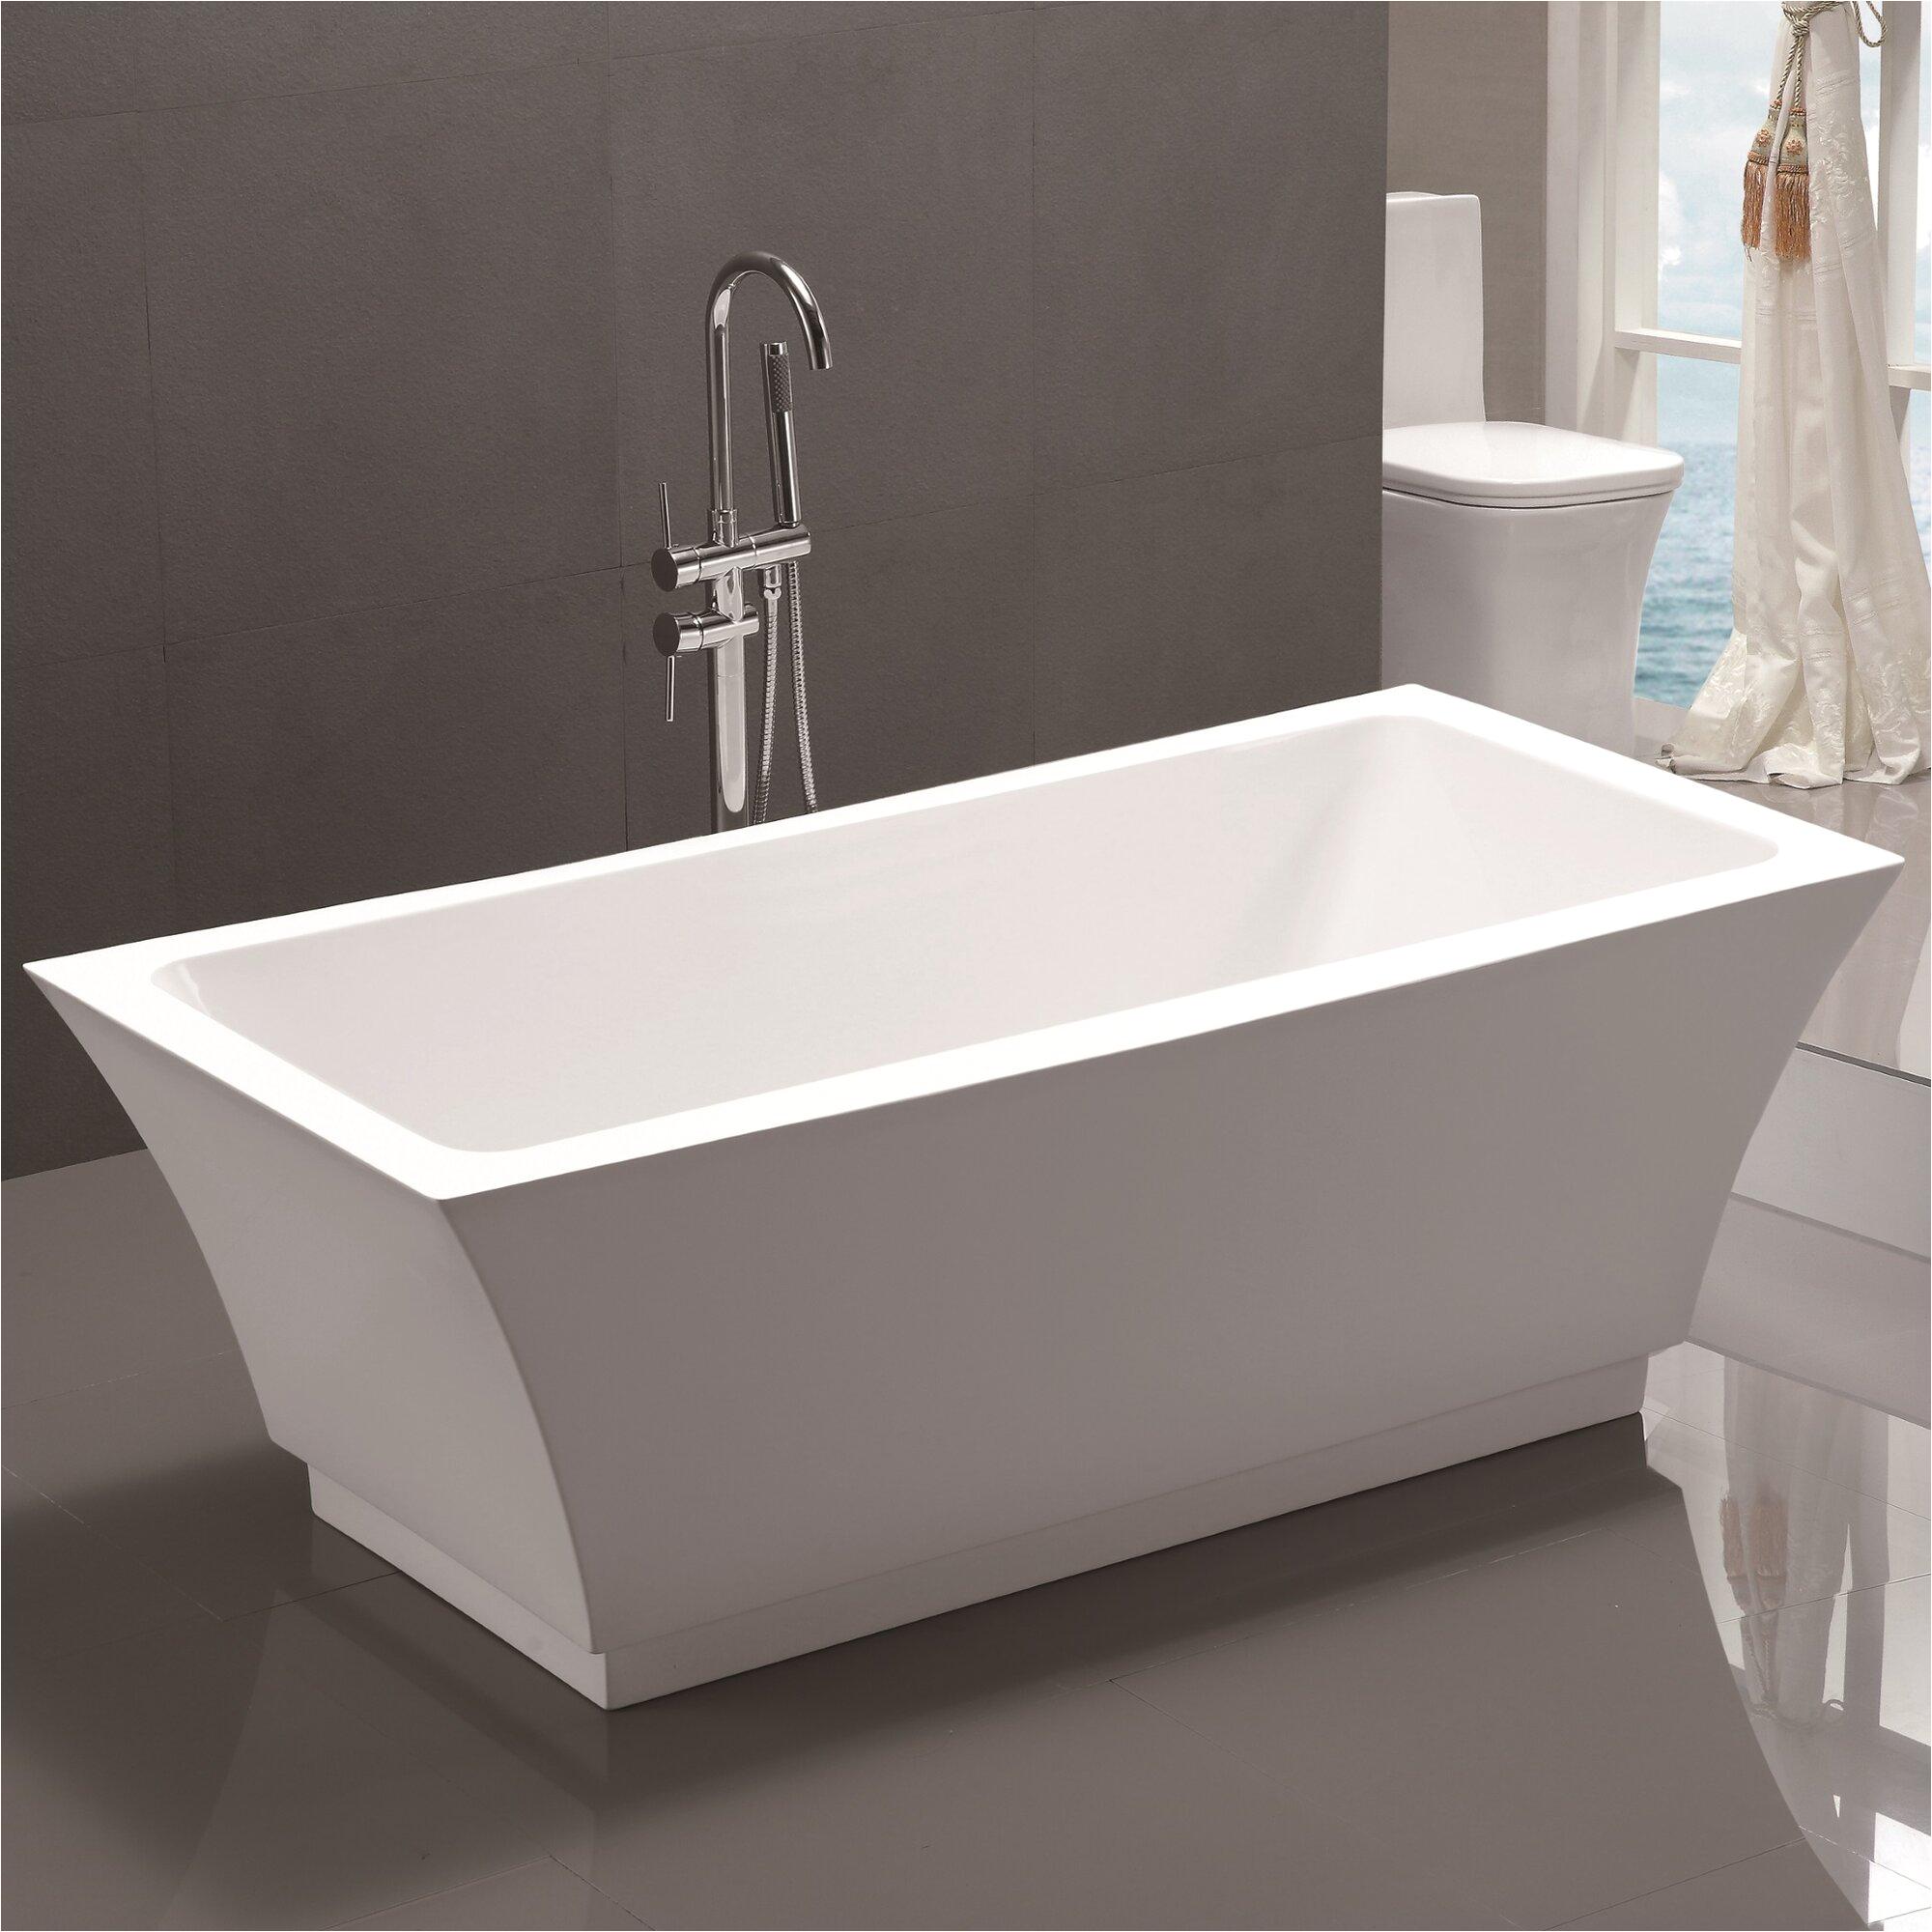 Vanity Art 59 x 29 5 Freestanding Soaking Bathtub VNAR1018